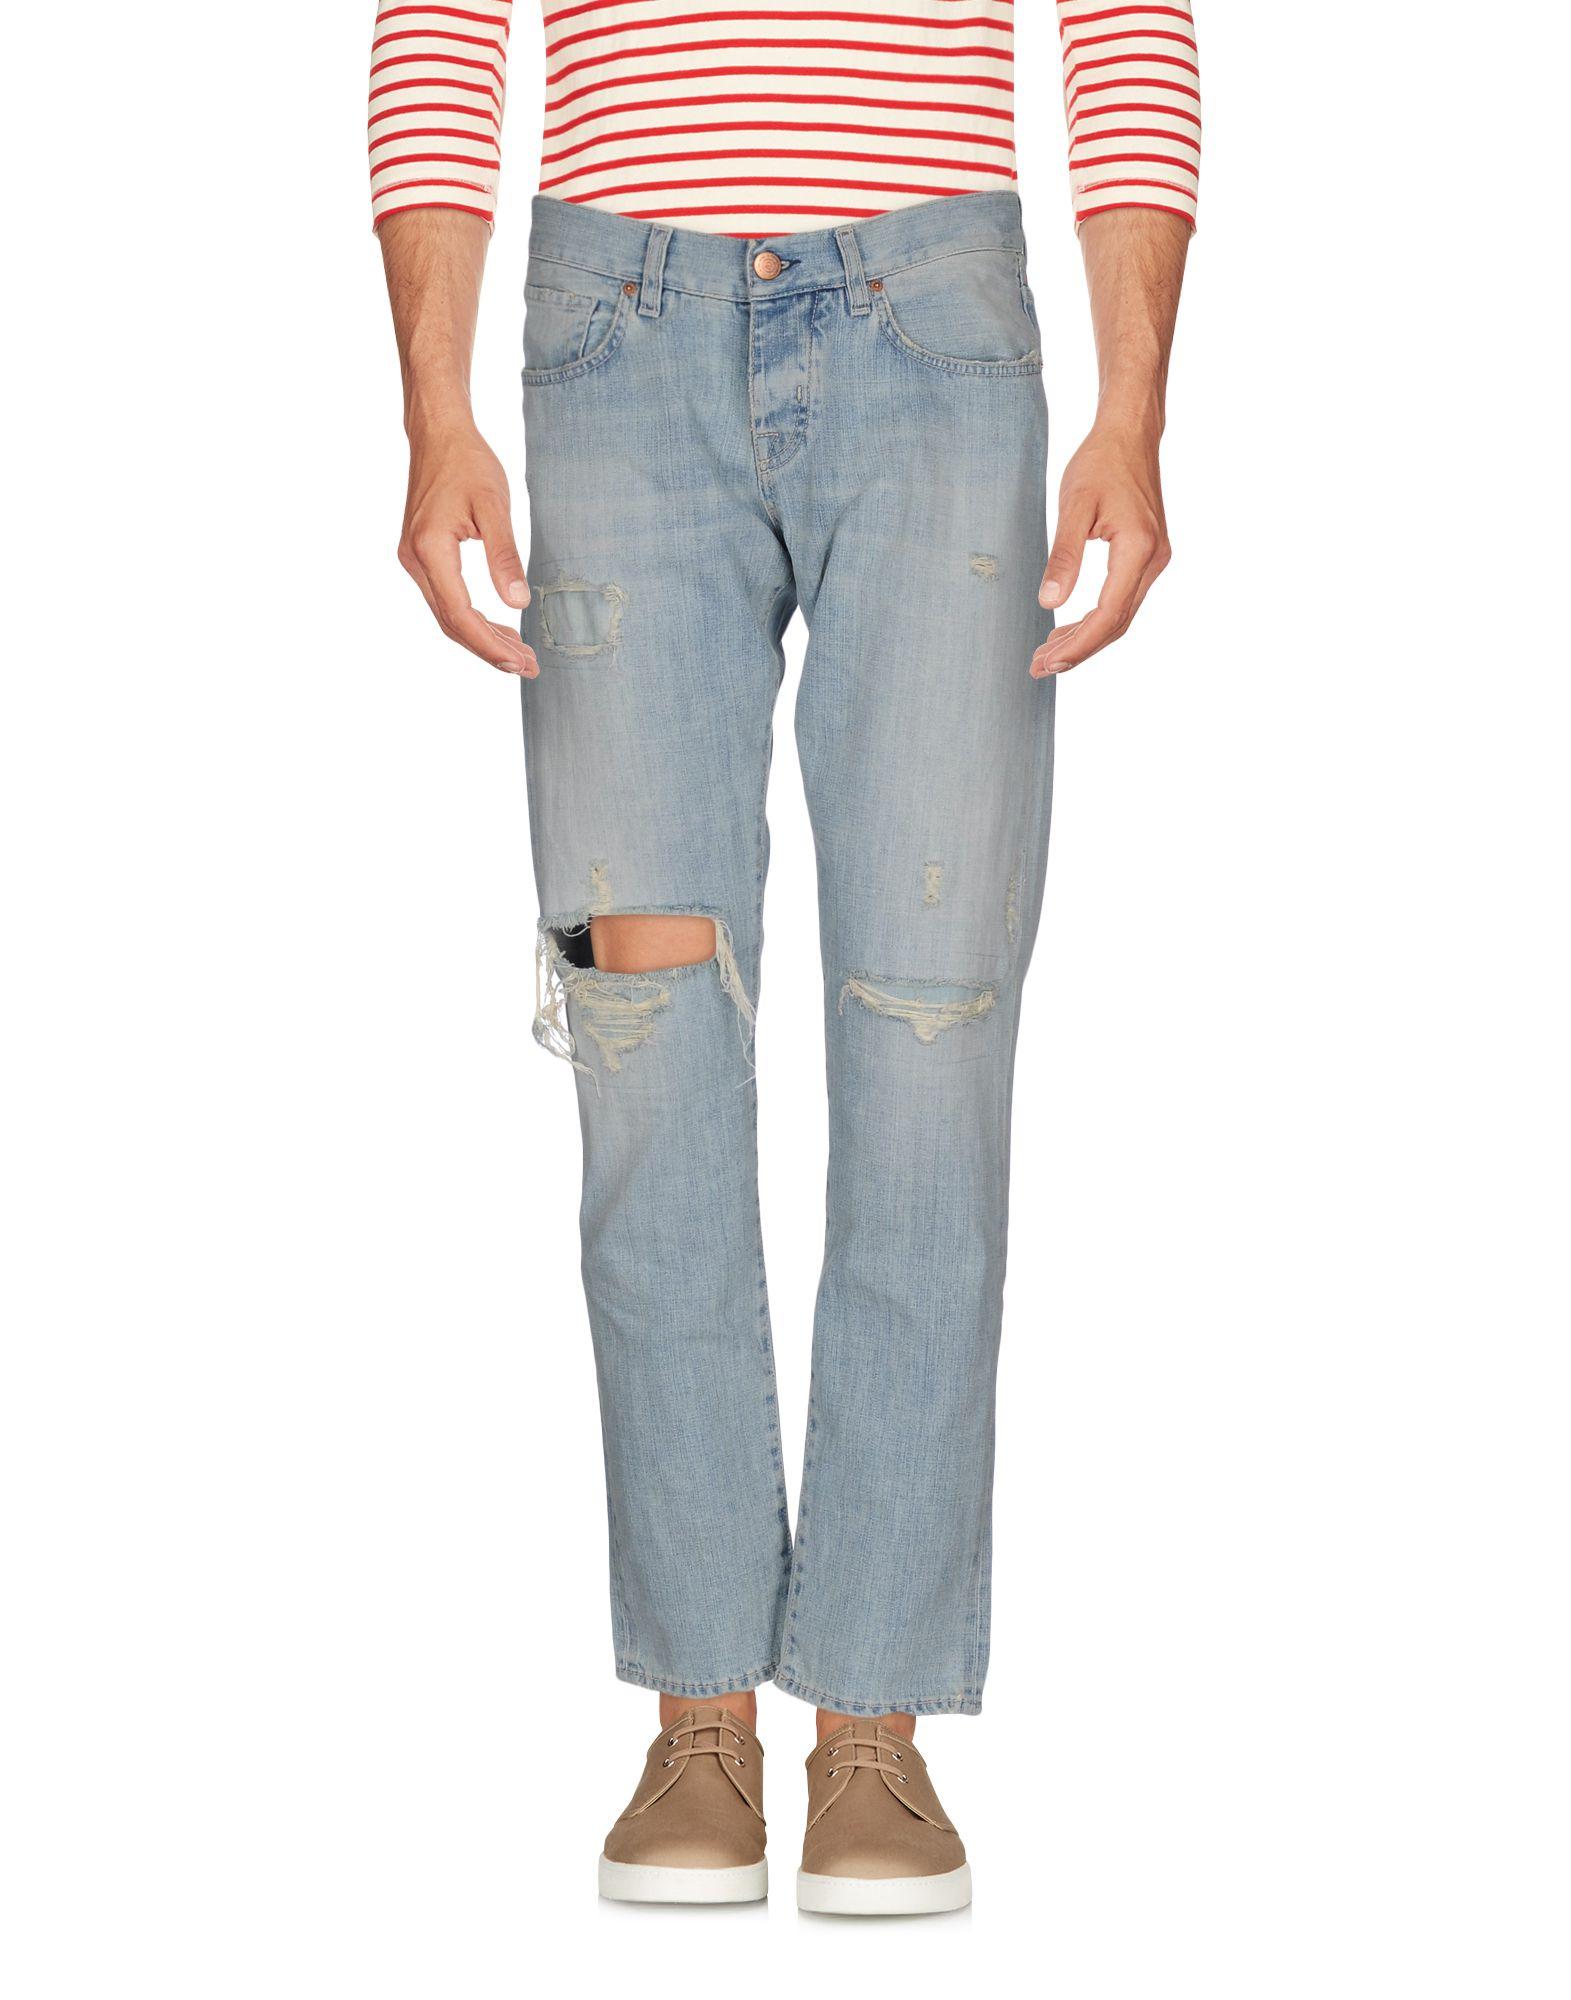 Pantaloni Jeans 2W2m Uomo - Acquista online su